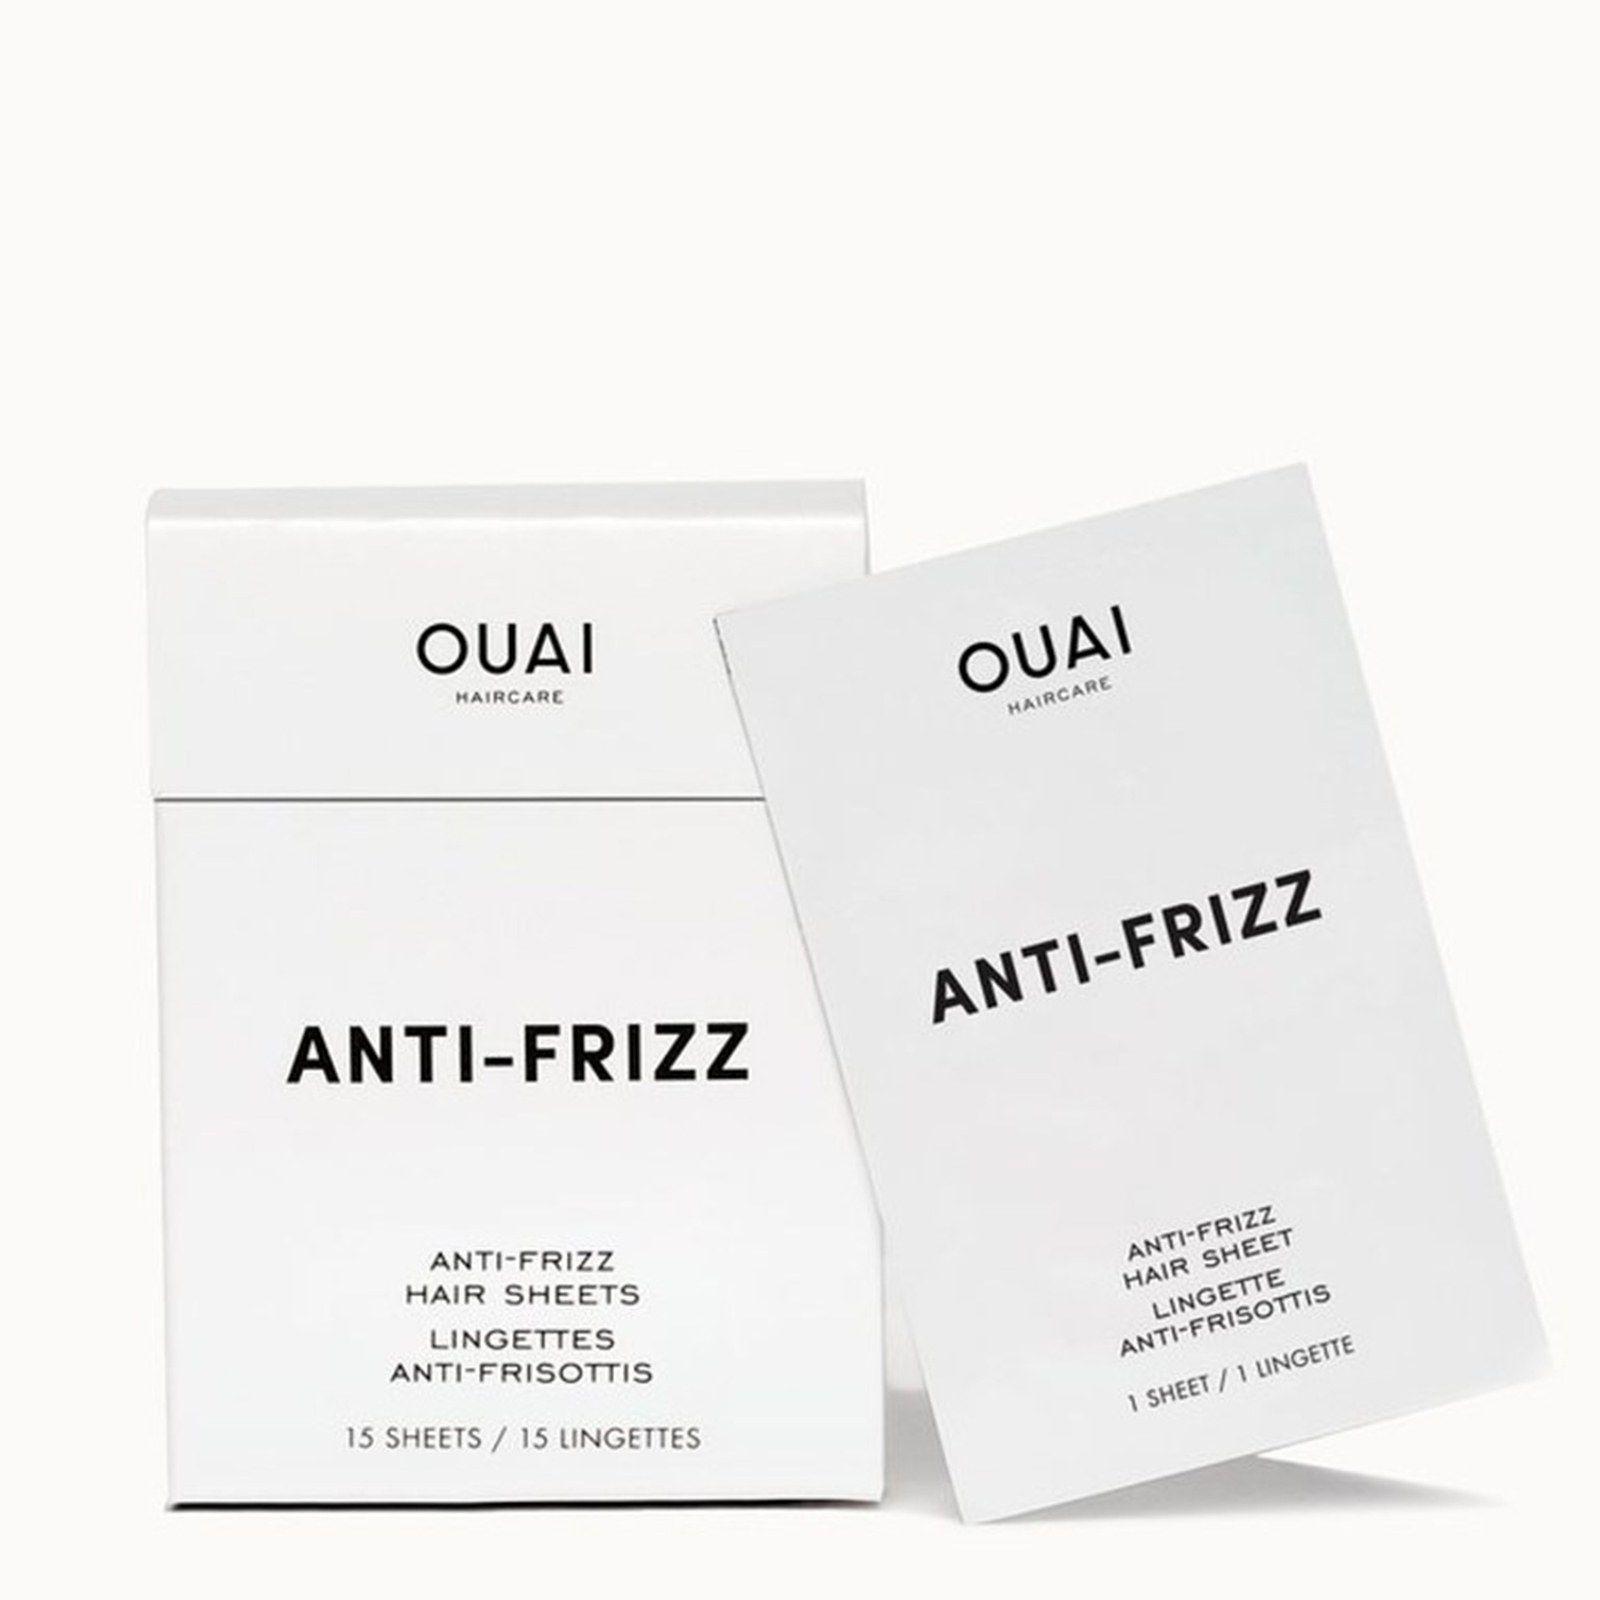 Ouai selalu punya produk rambut yang unik! Anti-Frizz Hair Sheets yang  dikemas seperti rokok ini diciptakan khusus untuk Anda yang memiliki  mobilitas tinggi ... 7ed1a0187b